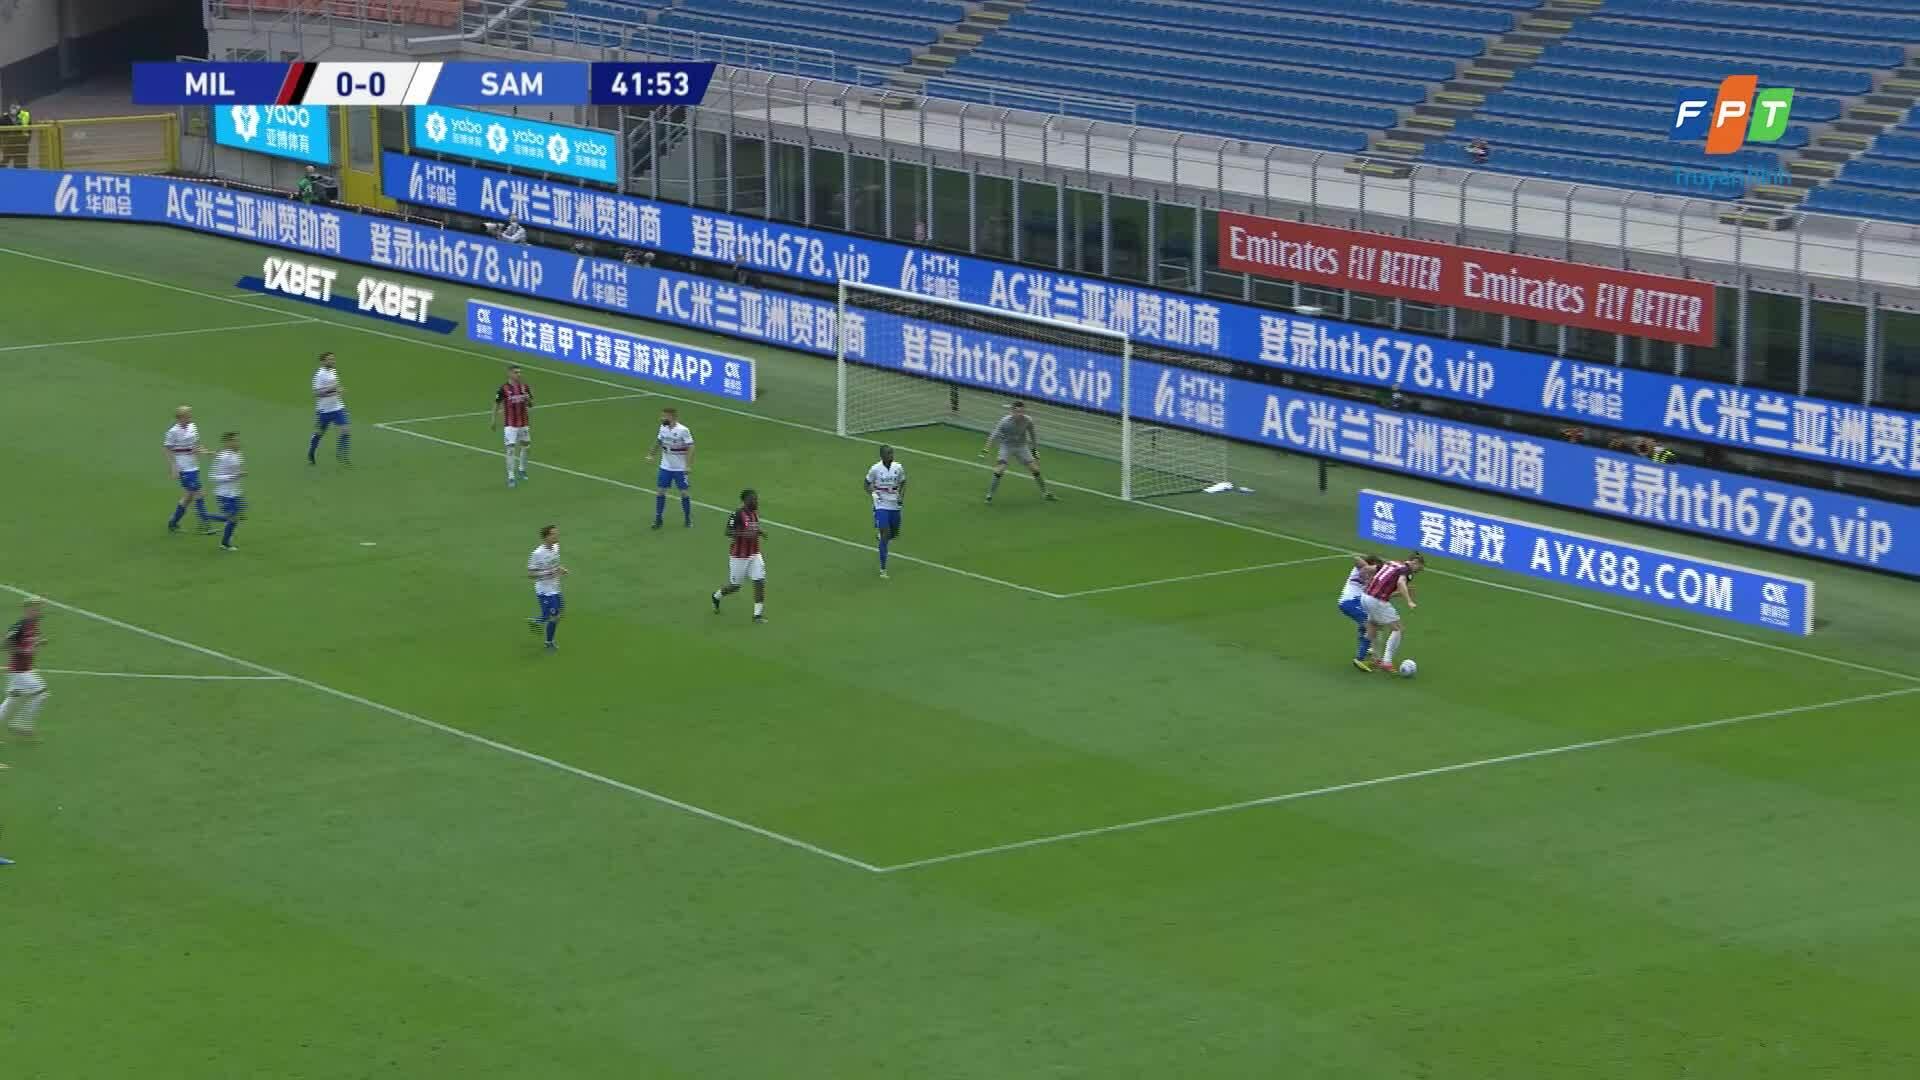 Milan 1-1 Sampdoria